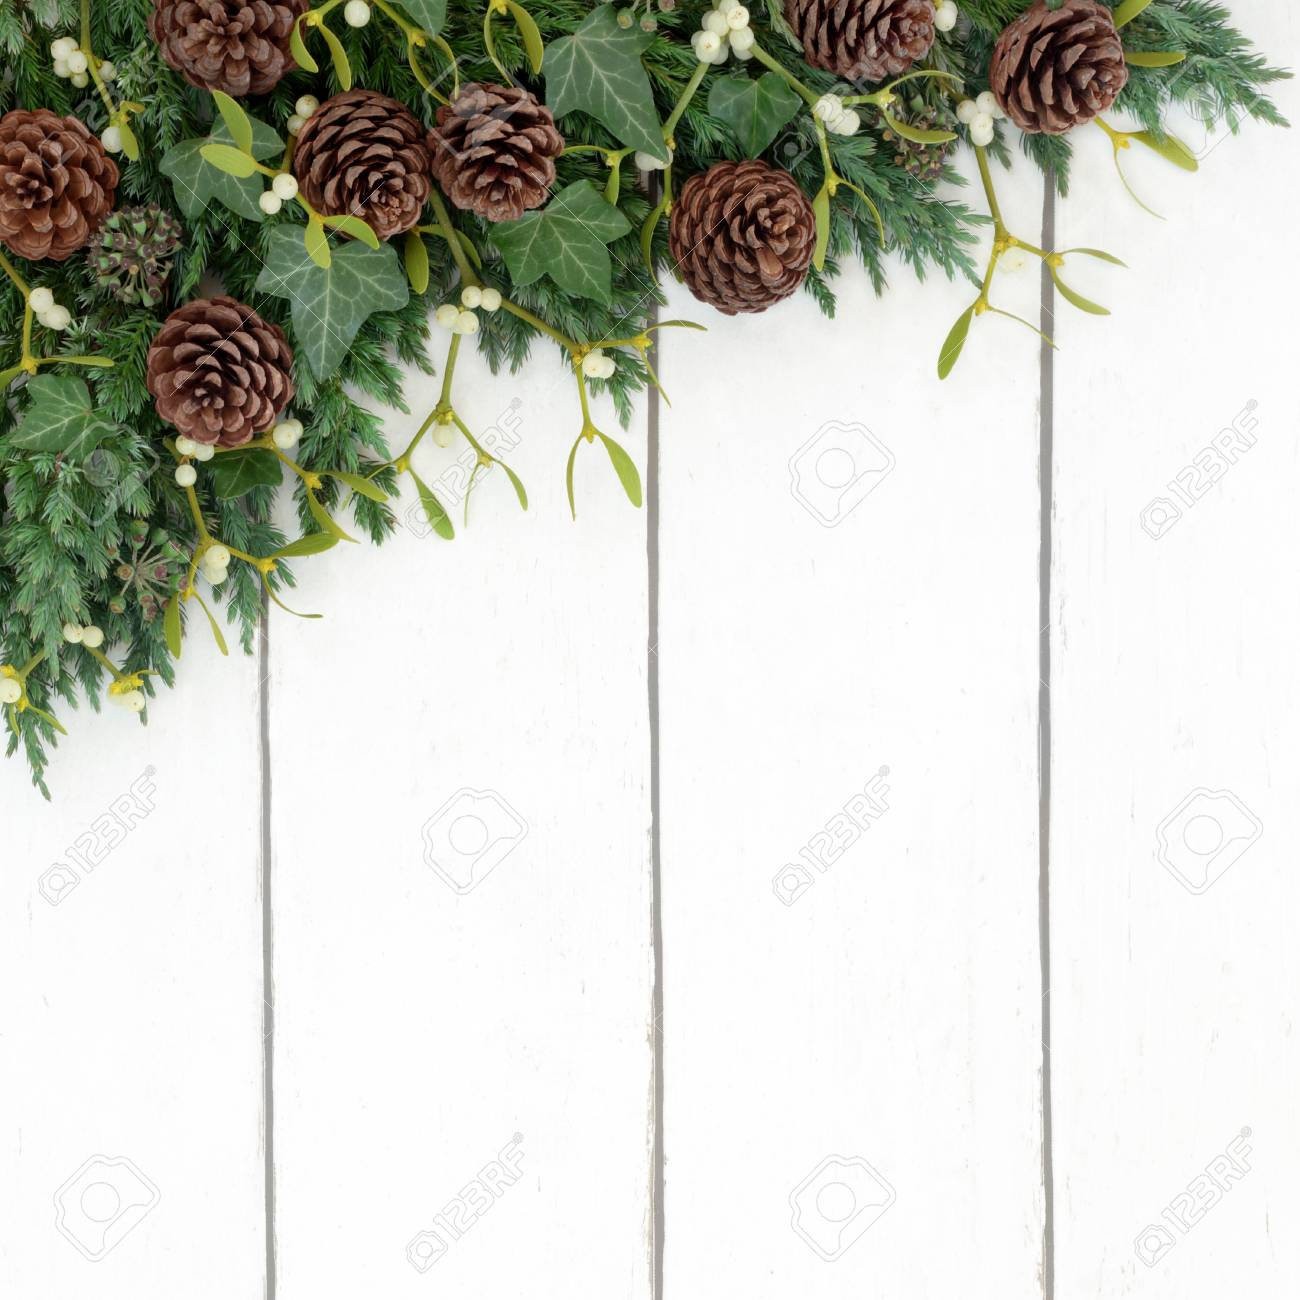 juniper fir mistletoe pine cone and ivy background winter border